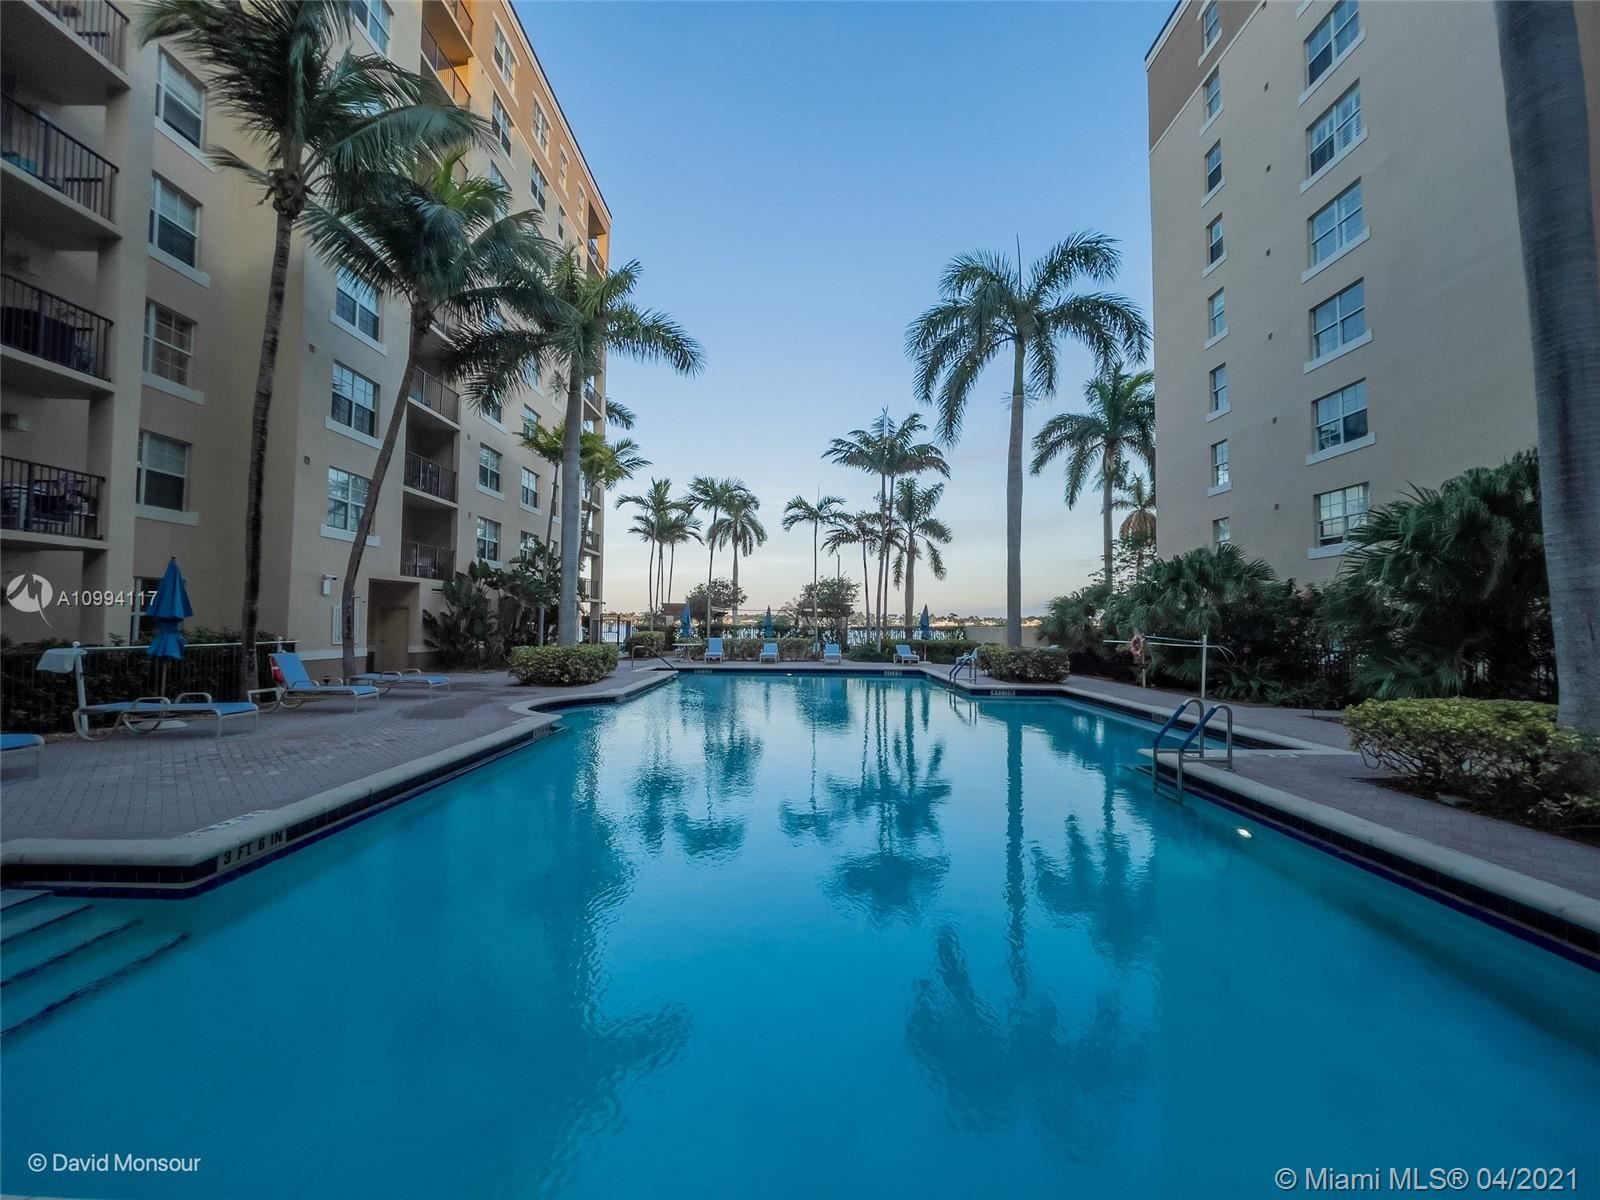 1801 N Flagler Dr #622, West Palm Beach, FL 33407 - #: A10994117